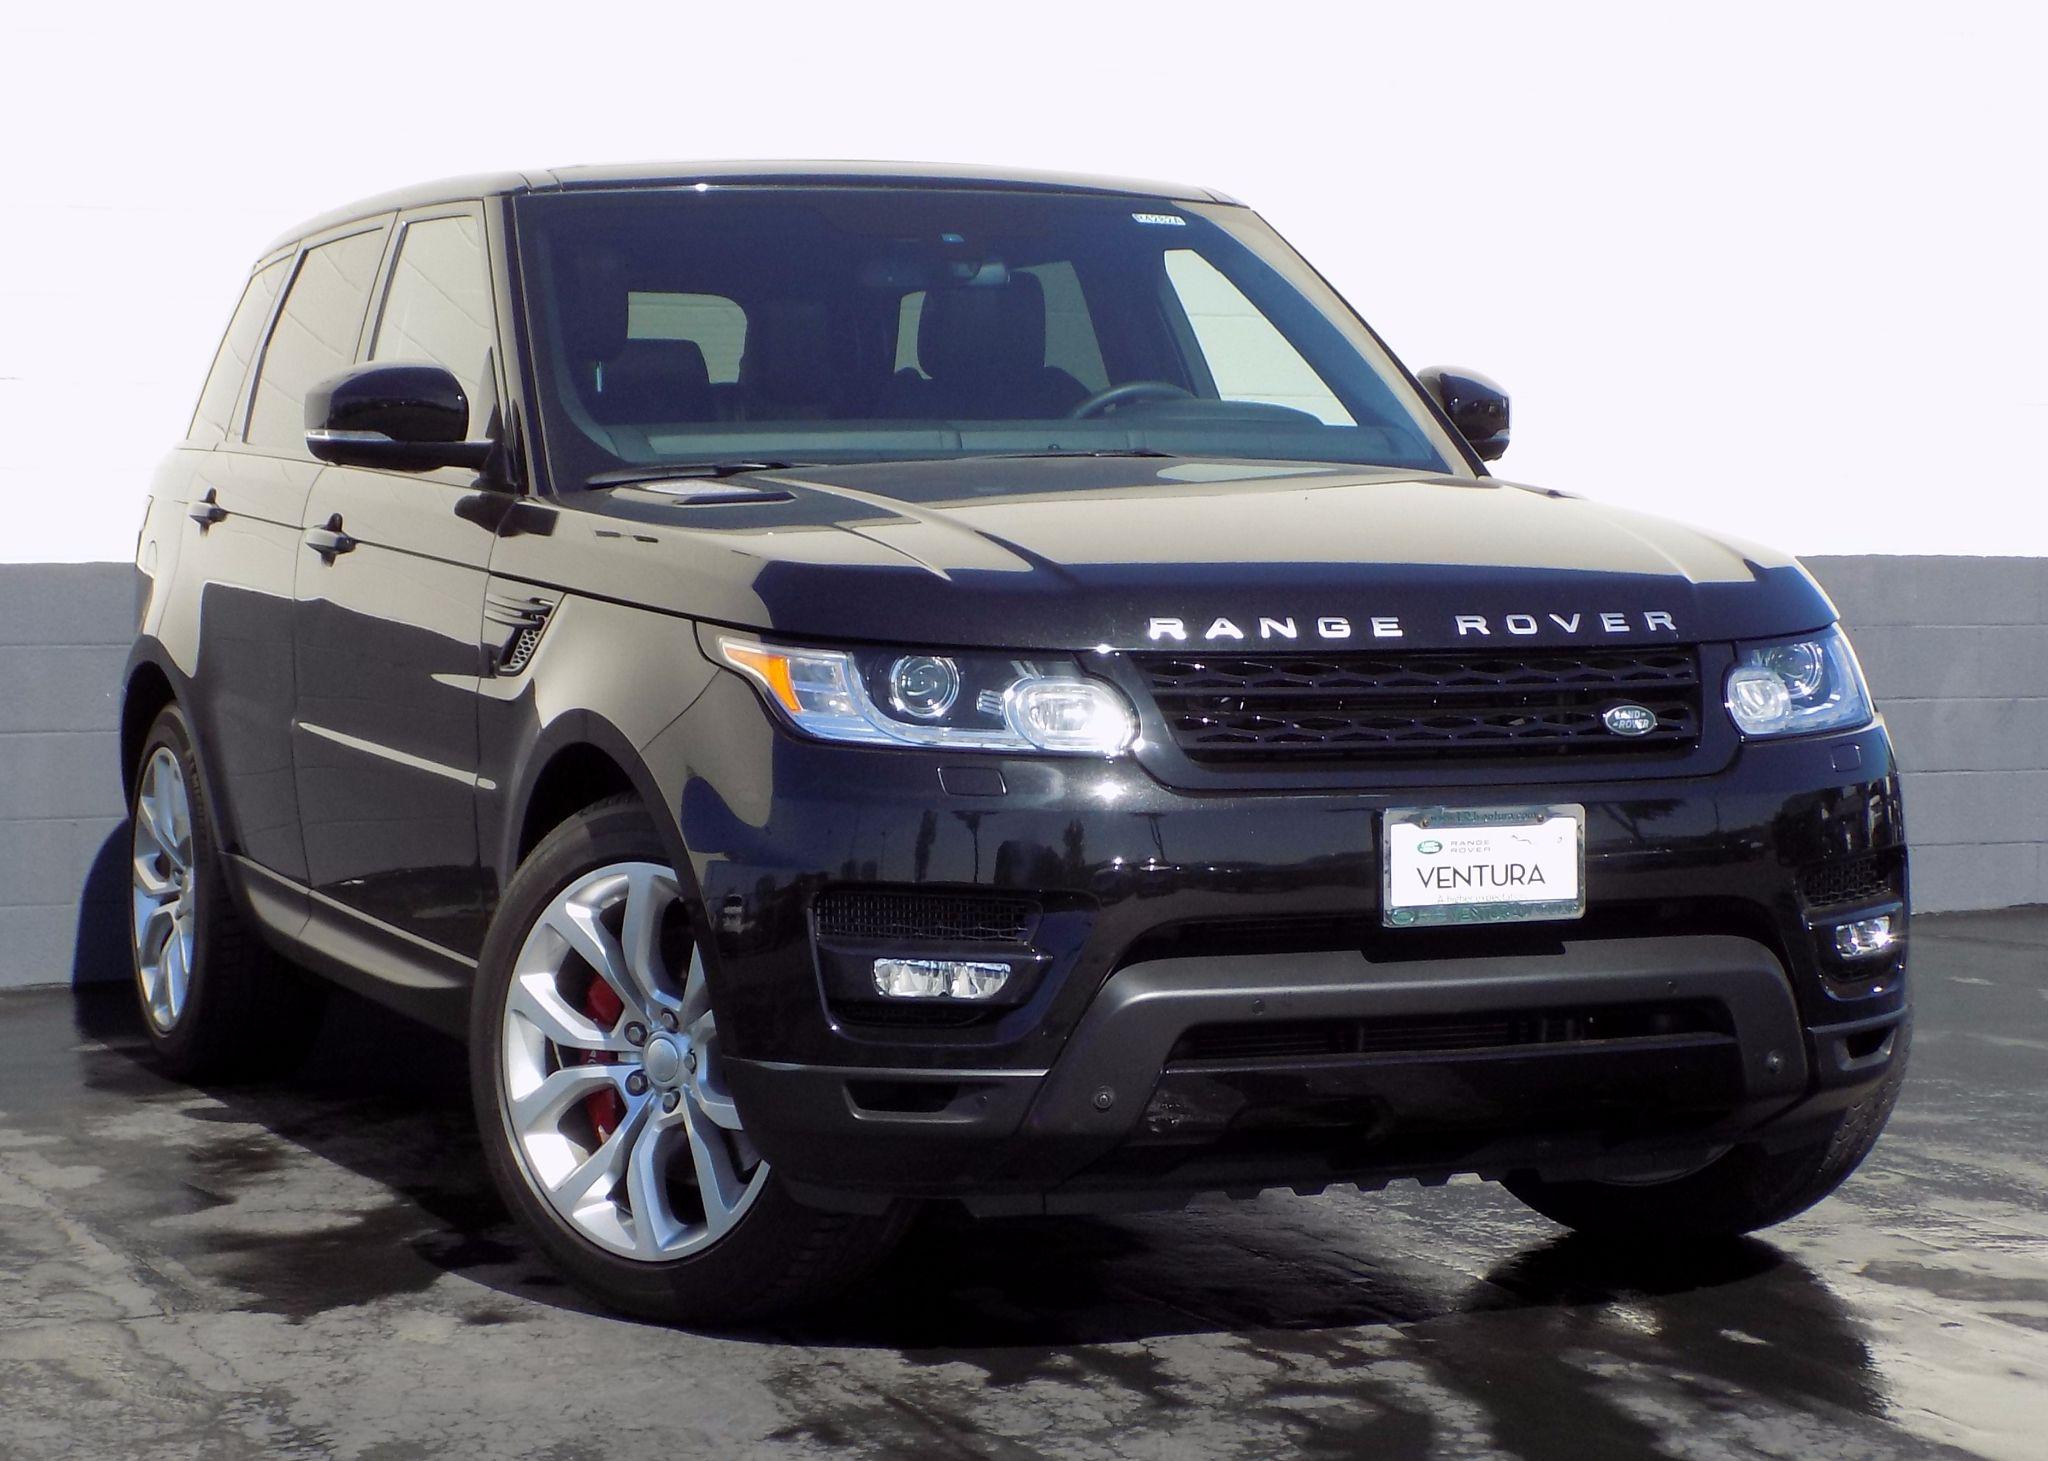 2014 Land Rover Range Rover Sport in Ventura Certified Land Rover